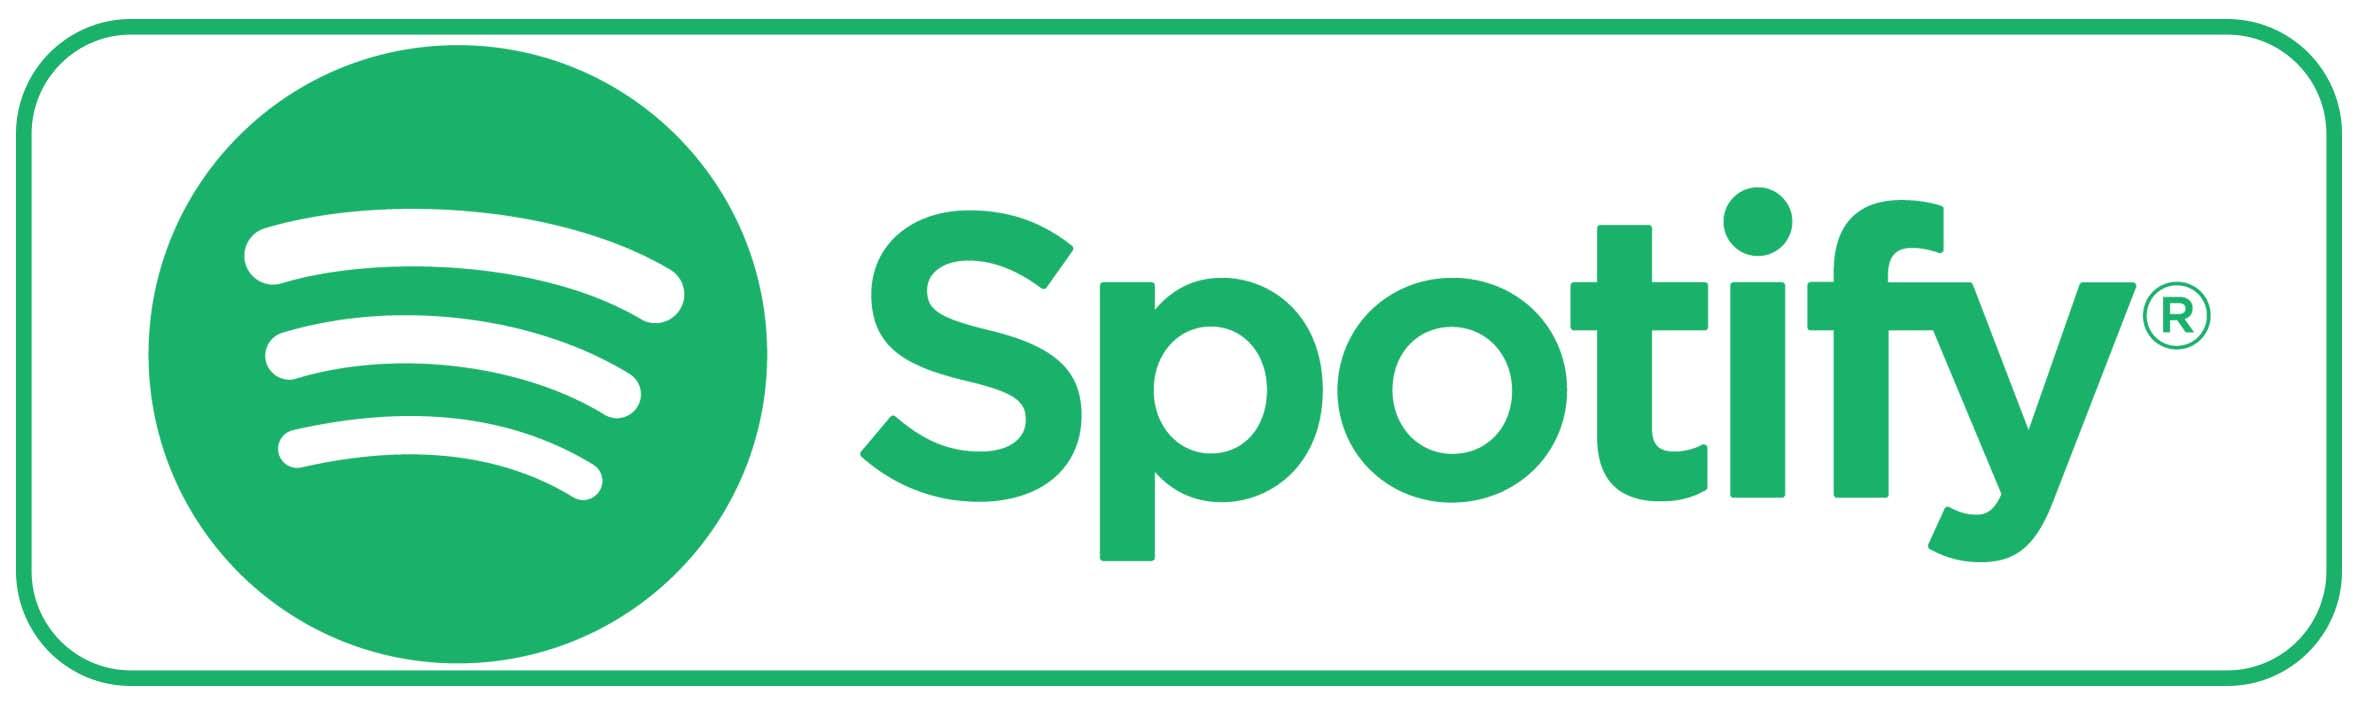 1Spotify.jpg